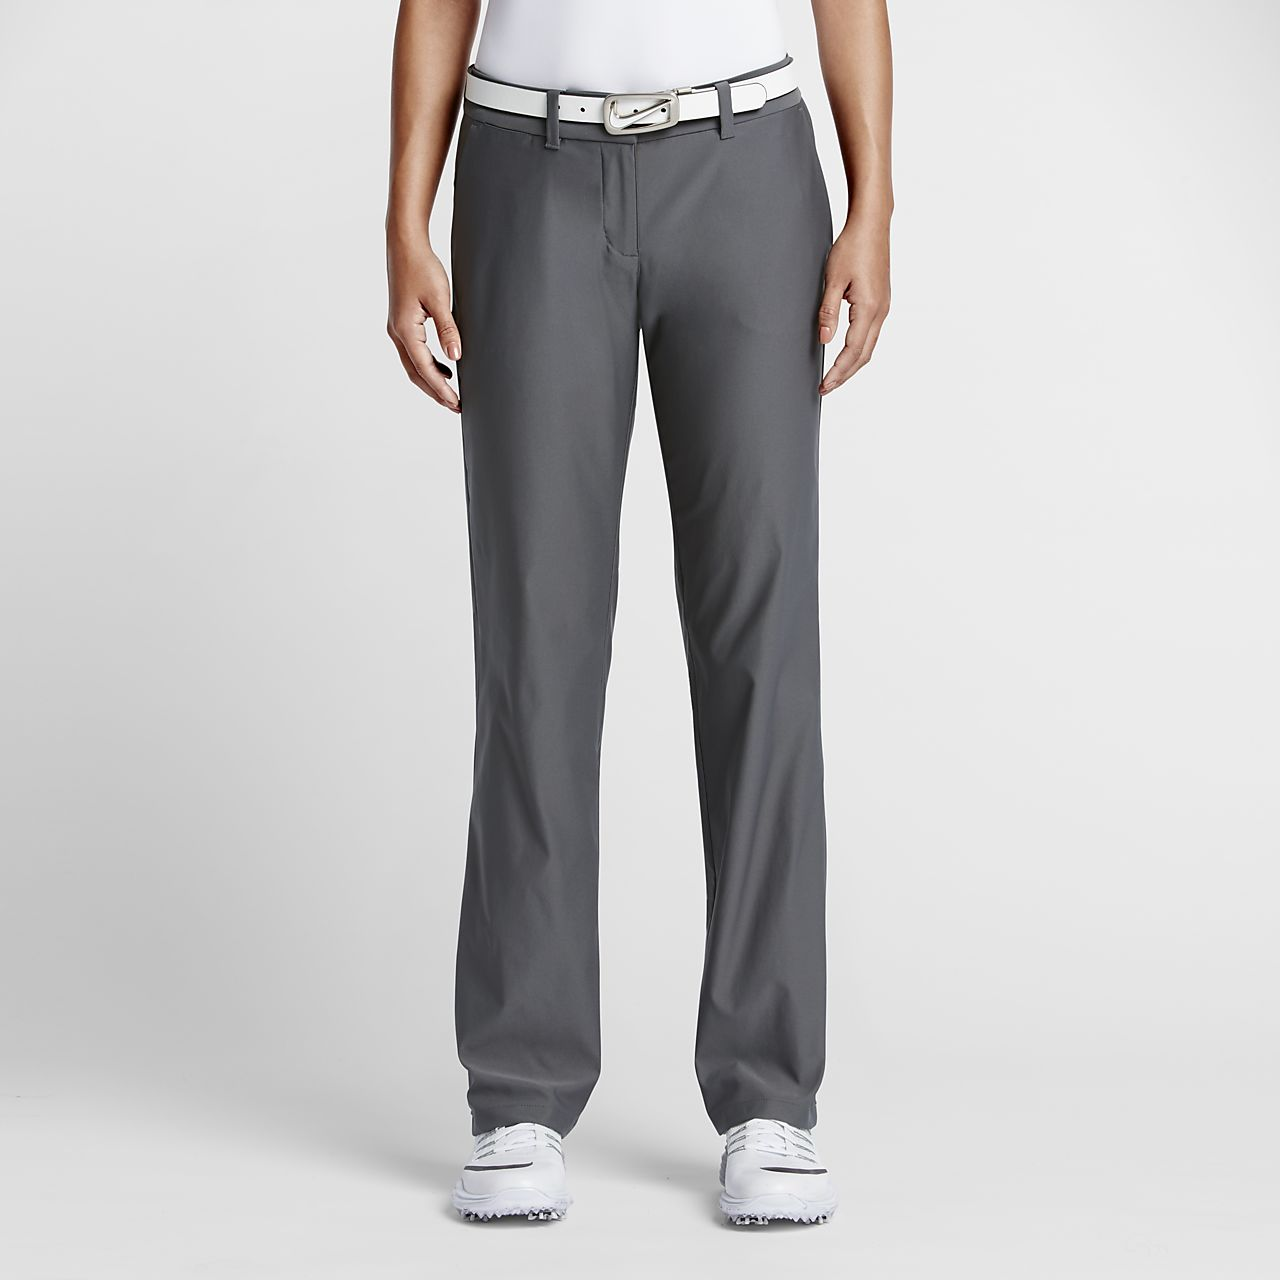 Nike Dry Damen-Golfhose